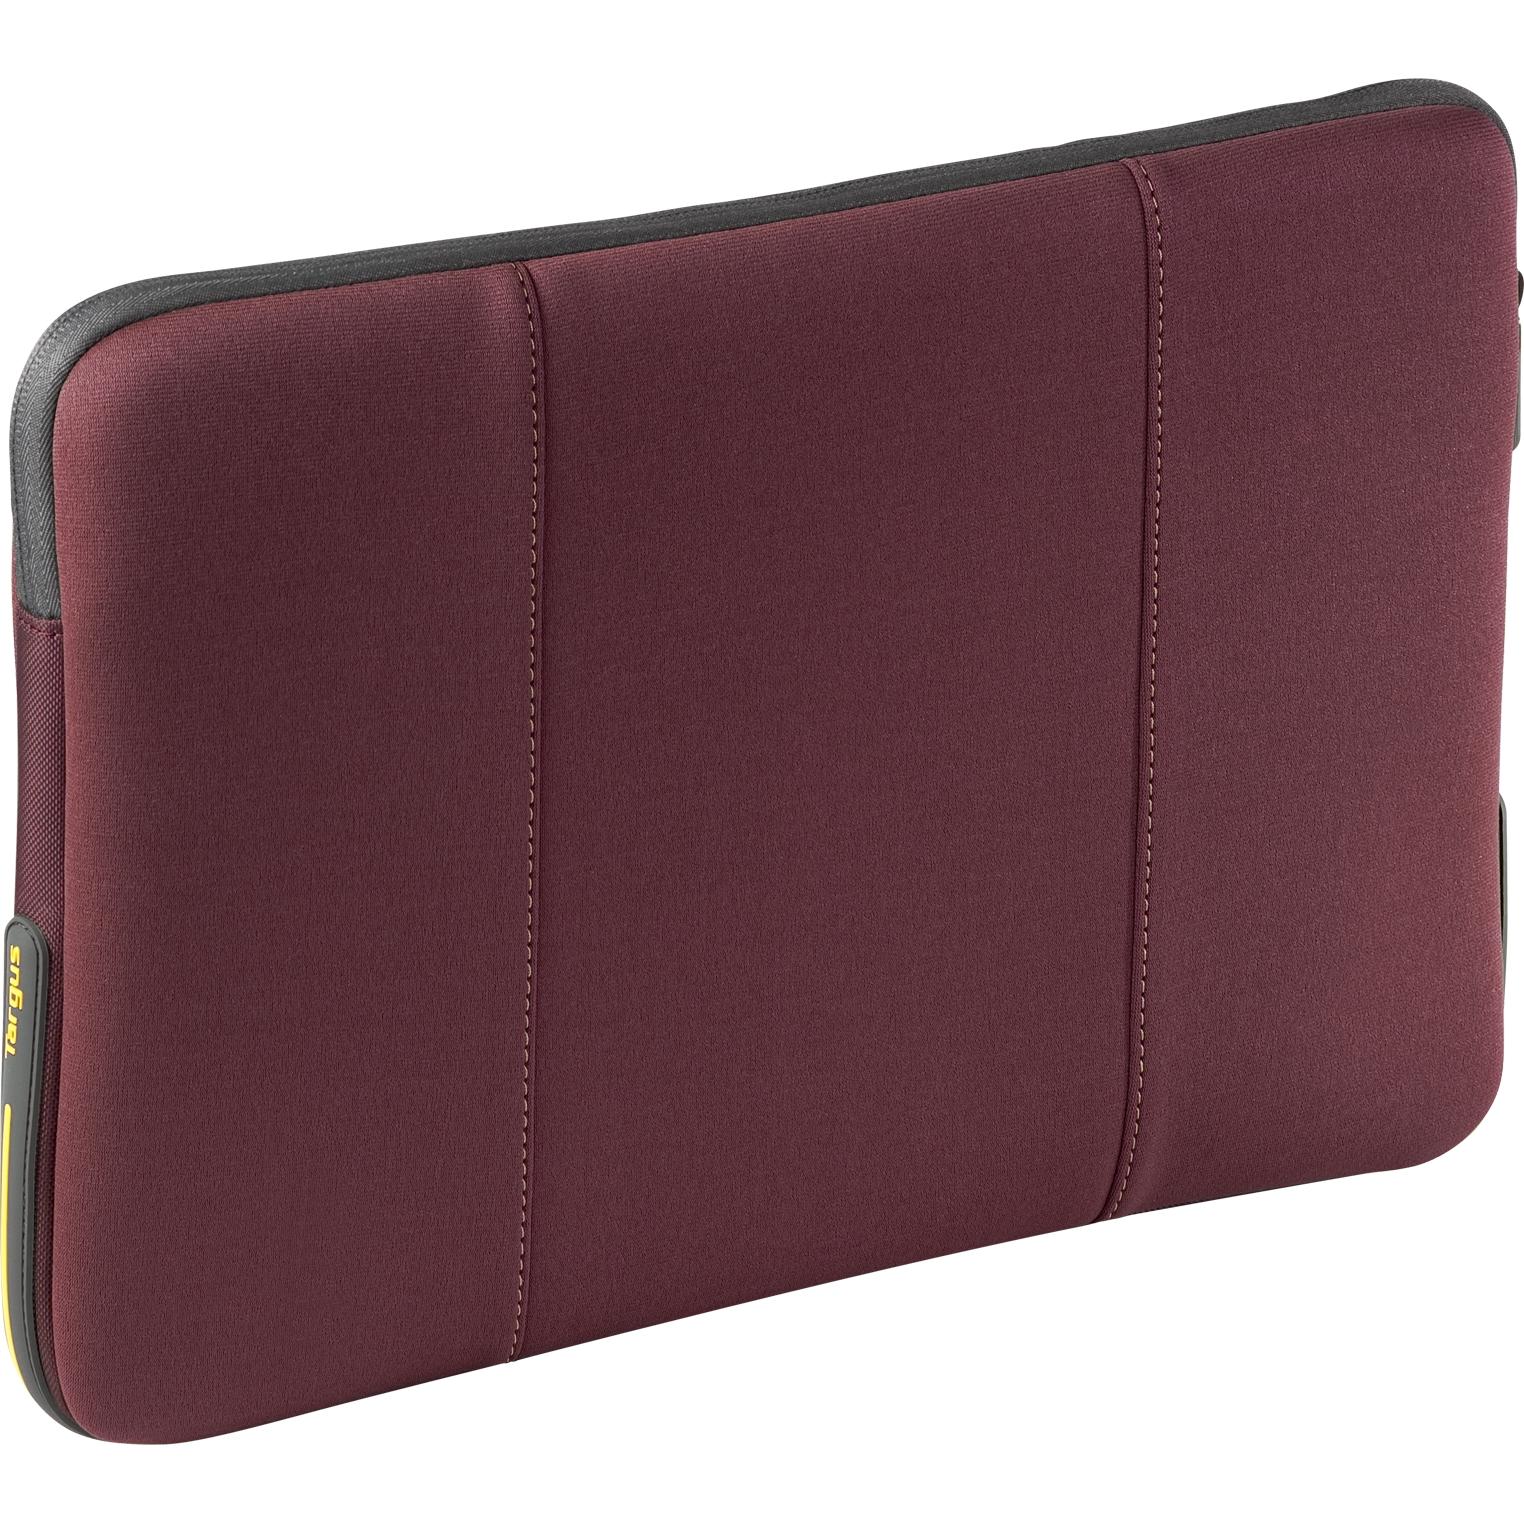 impax sleeve for 17 macbook pro tss27801us red sleeves targus. Black Bedroom Furniture Sets. Home Design Ideas